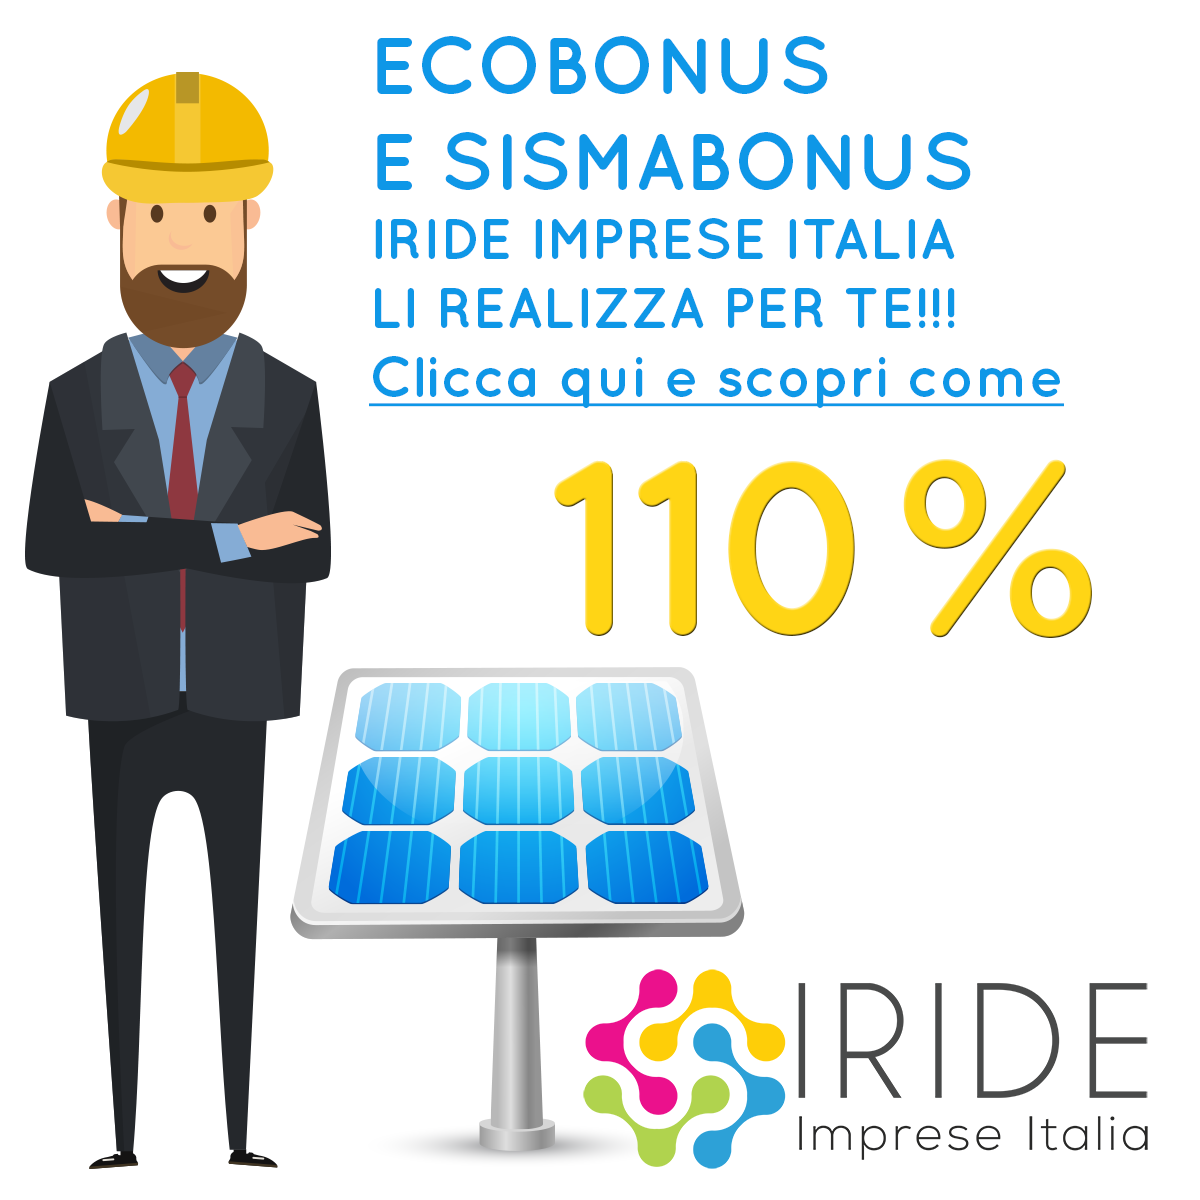 Iride Imprese Italia